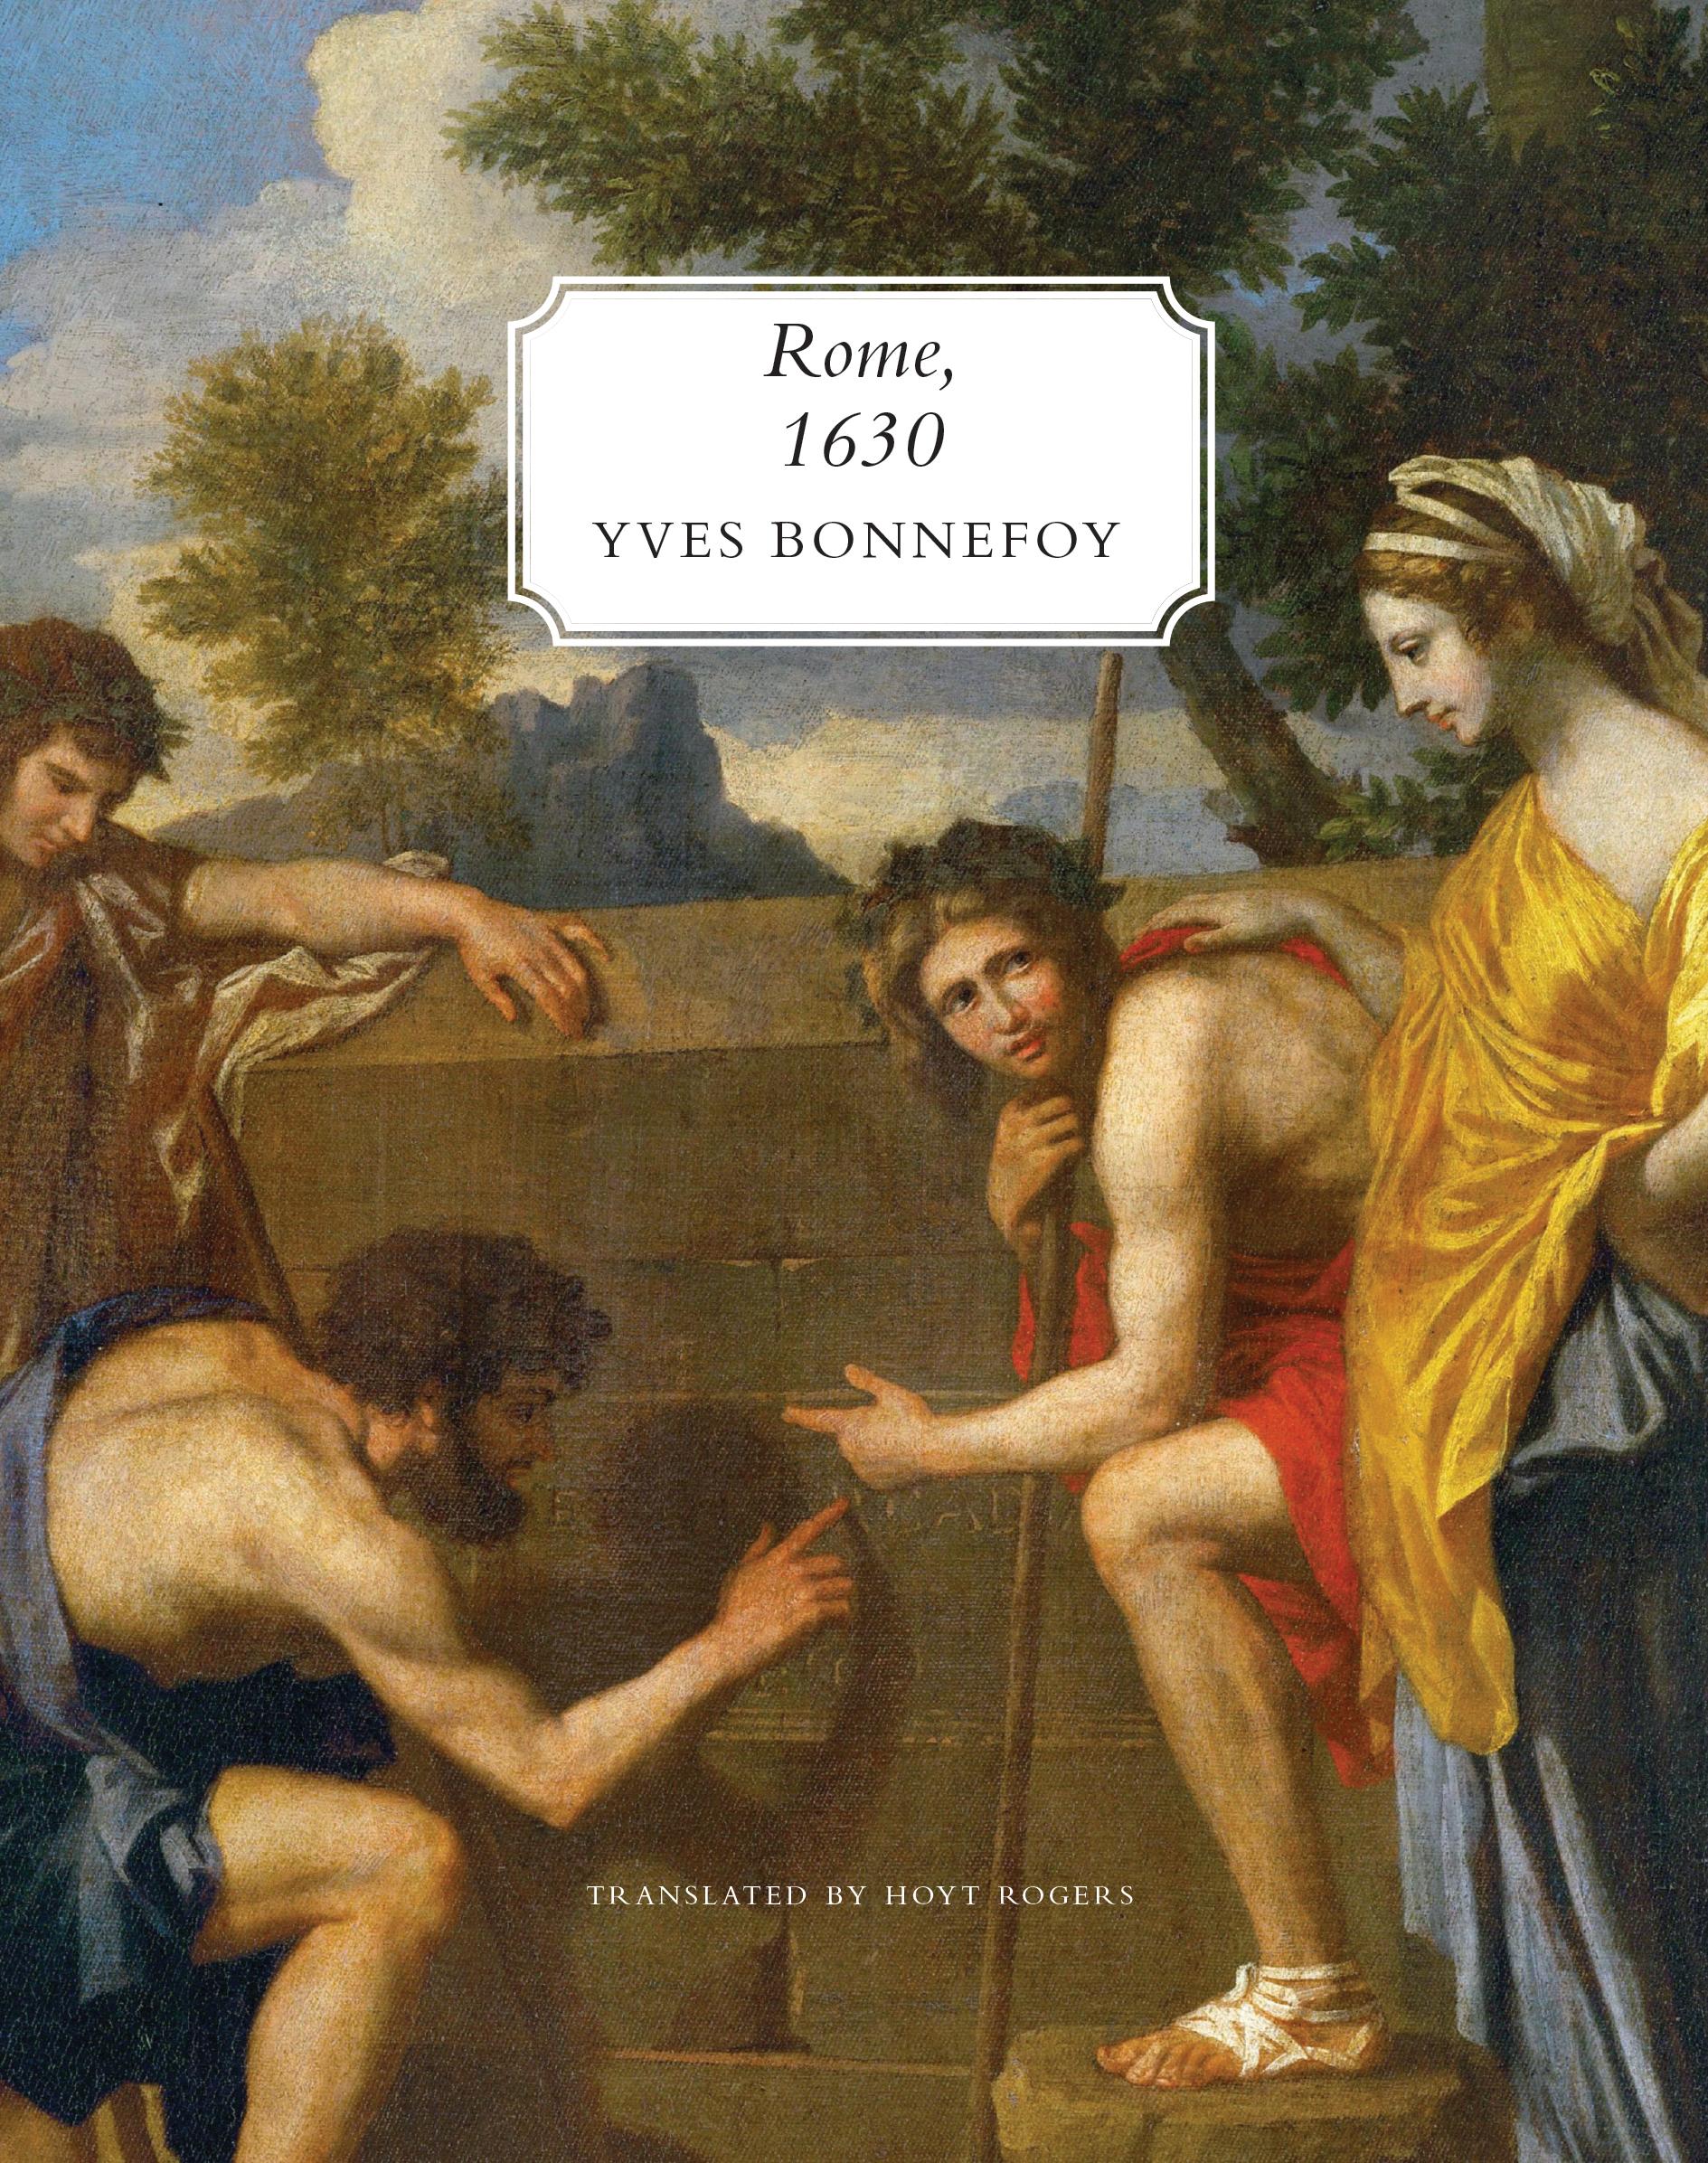 Rome, 1630 by Yves Bonnefoy   Seagull Books